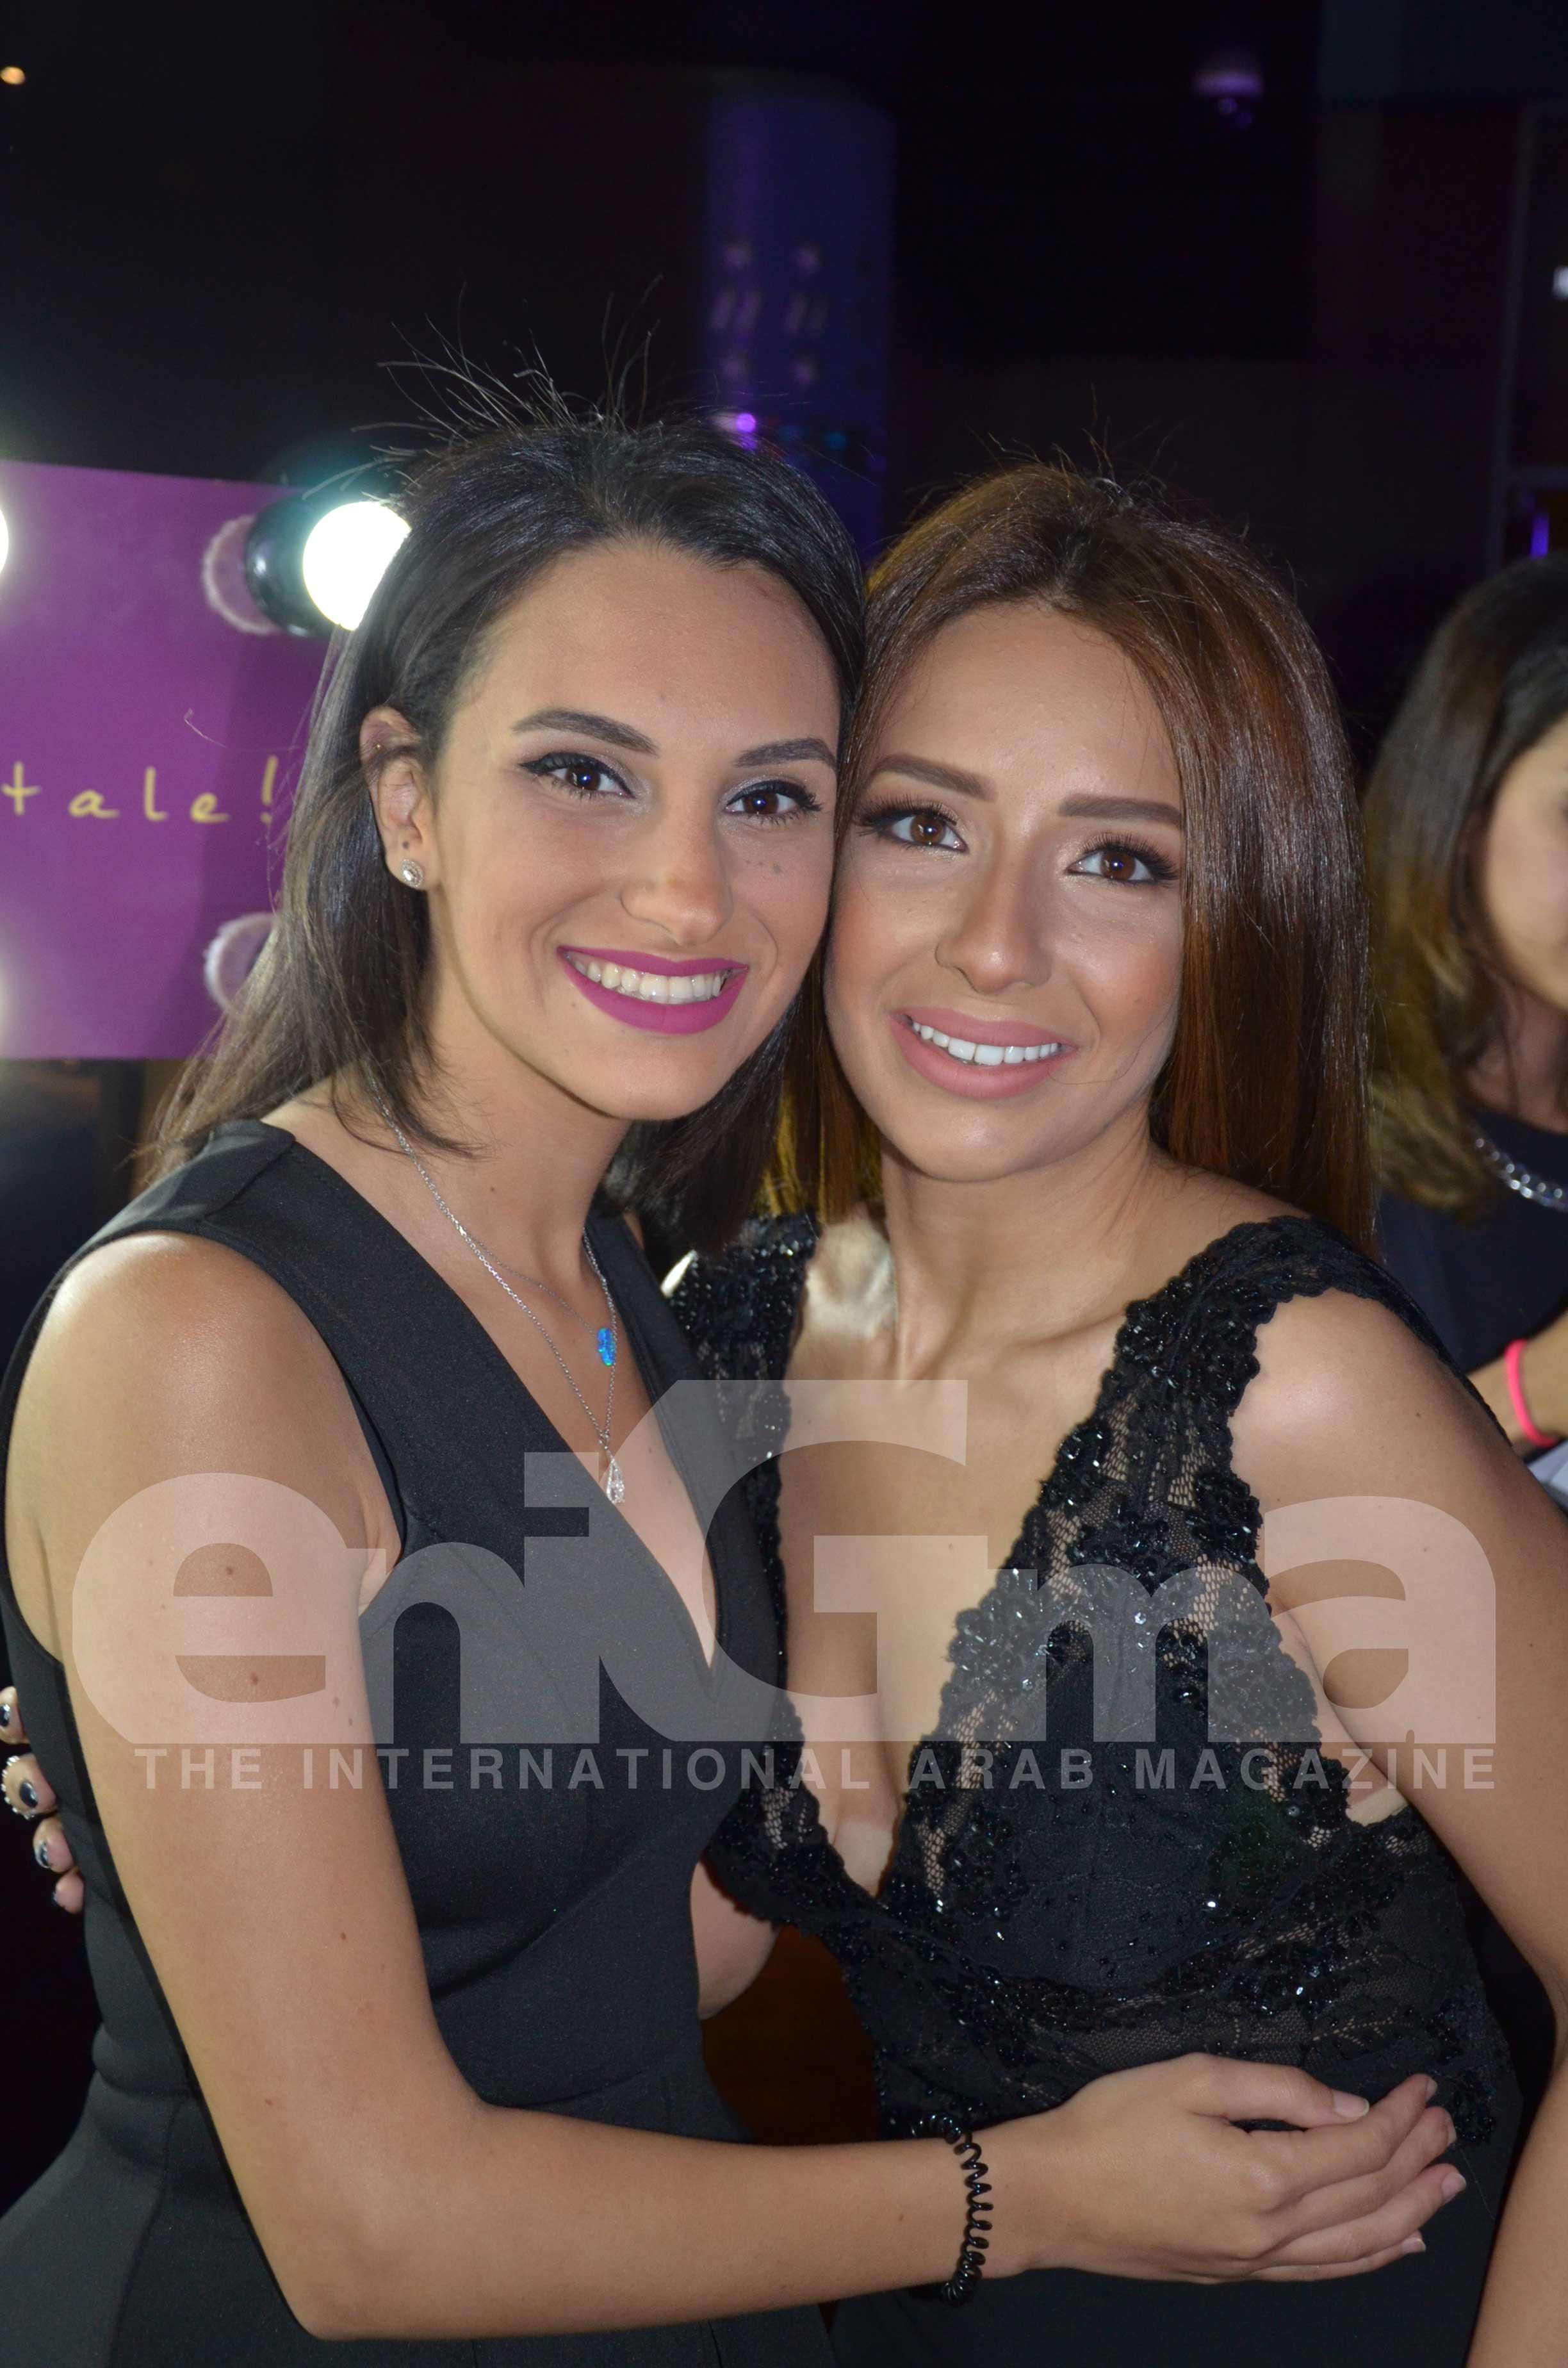 Ms. Dalia Kafafy & Ms. Yasmine Abdelnabi